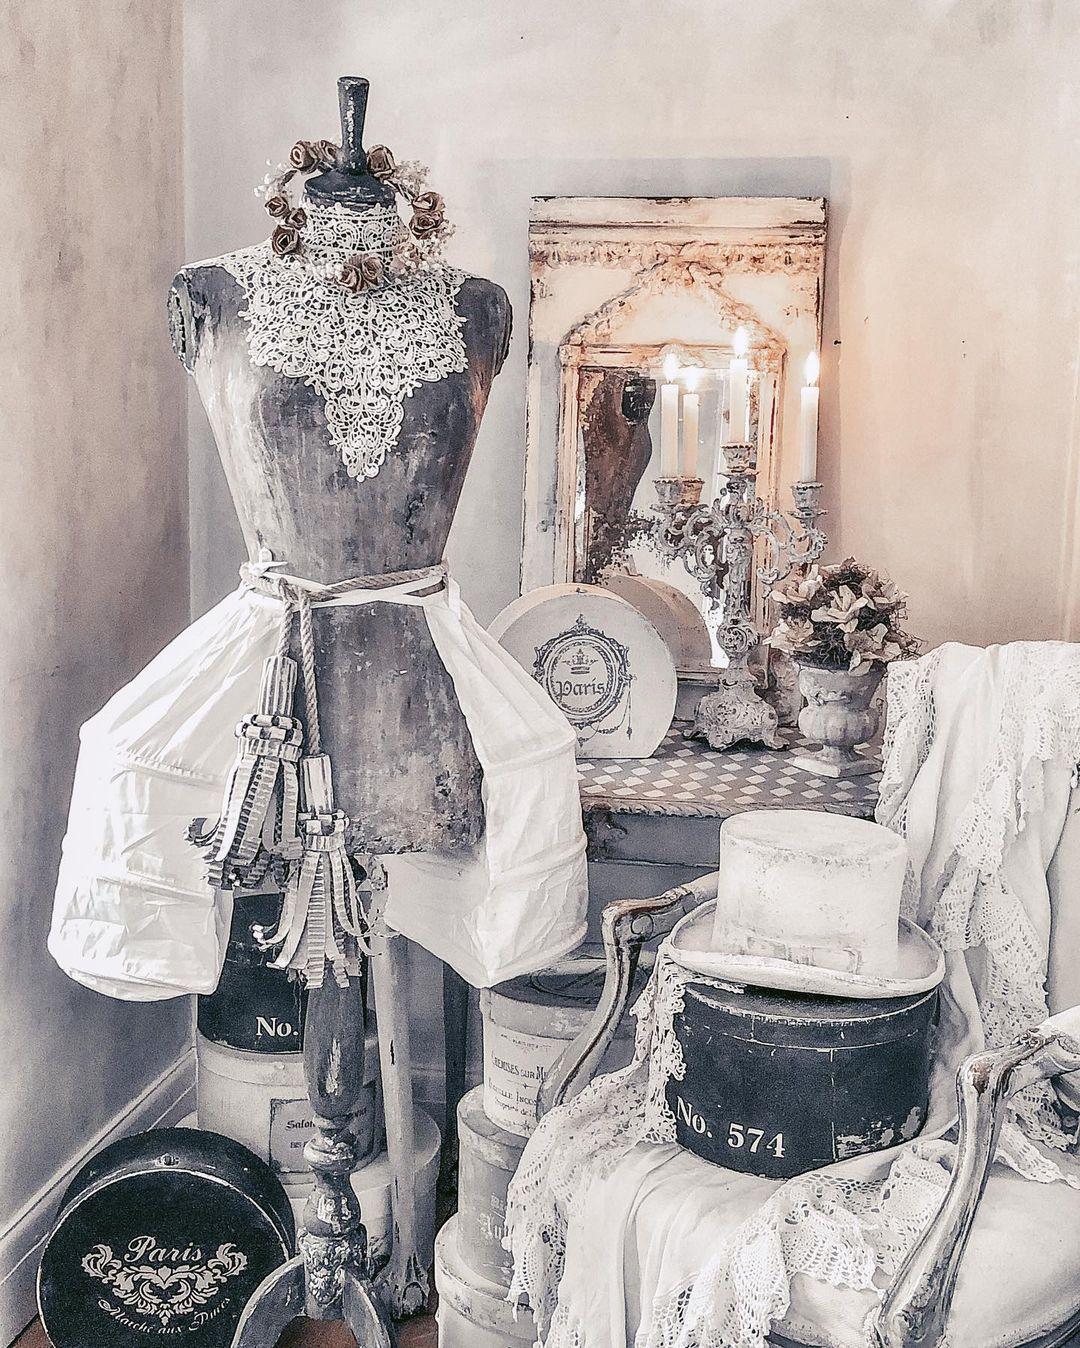 "Katarzyna Bujnowska on Instagram: ""🍂⚜️🍂⚜️🍂⚜️🍂 #vintagestyle #mannequin #handpainted #patinastyle #antiquemannequin #vintagedressform #shabbychicdecor #frenchhomedecor…"""